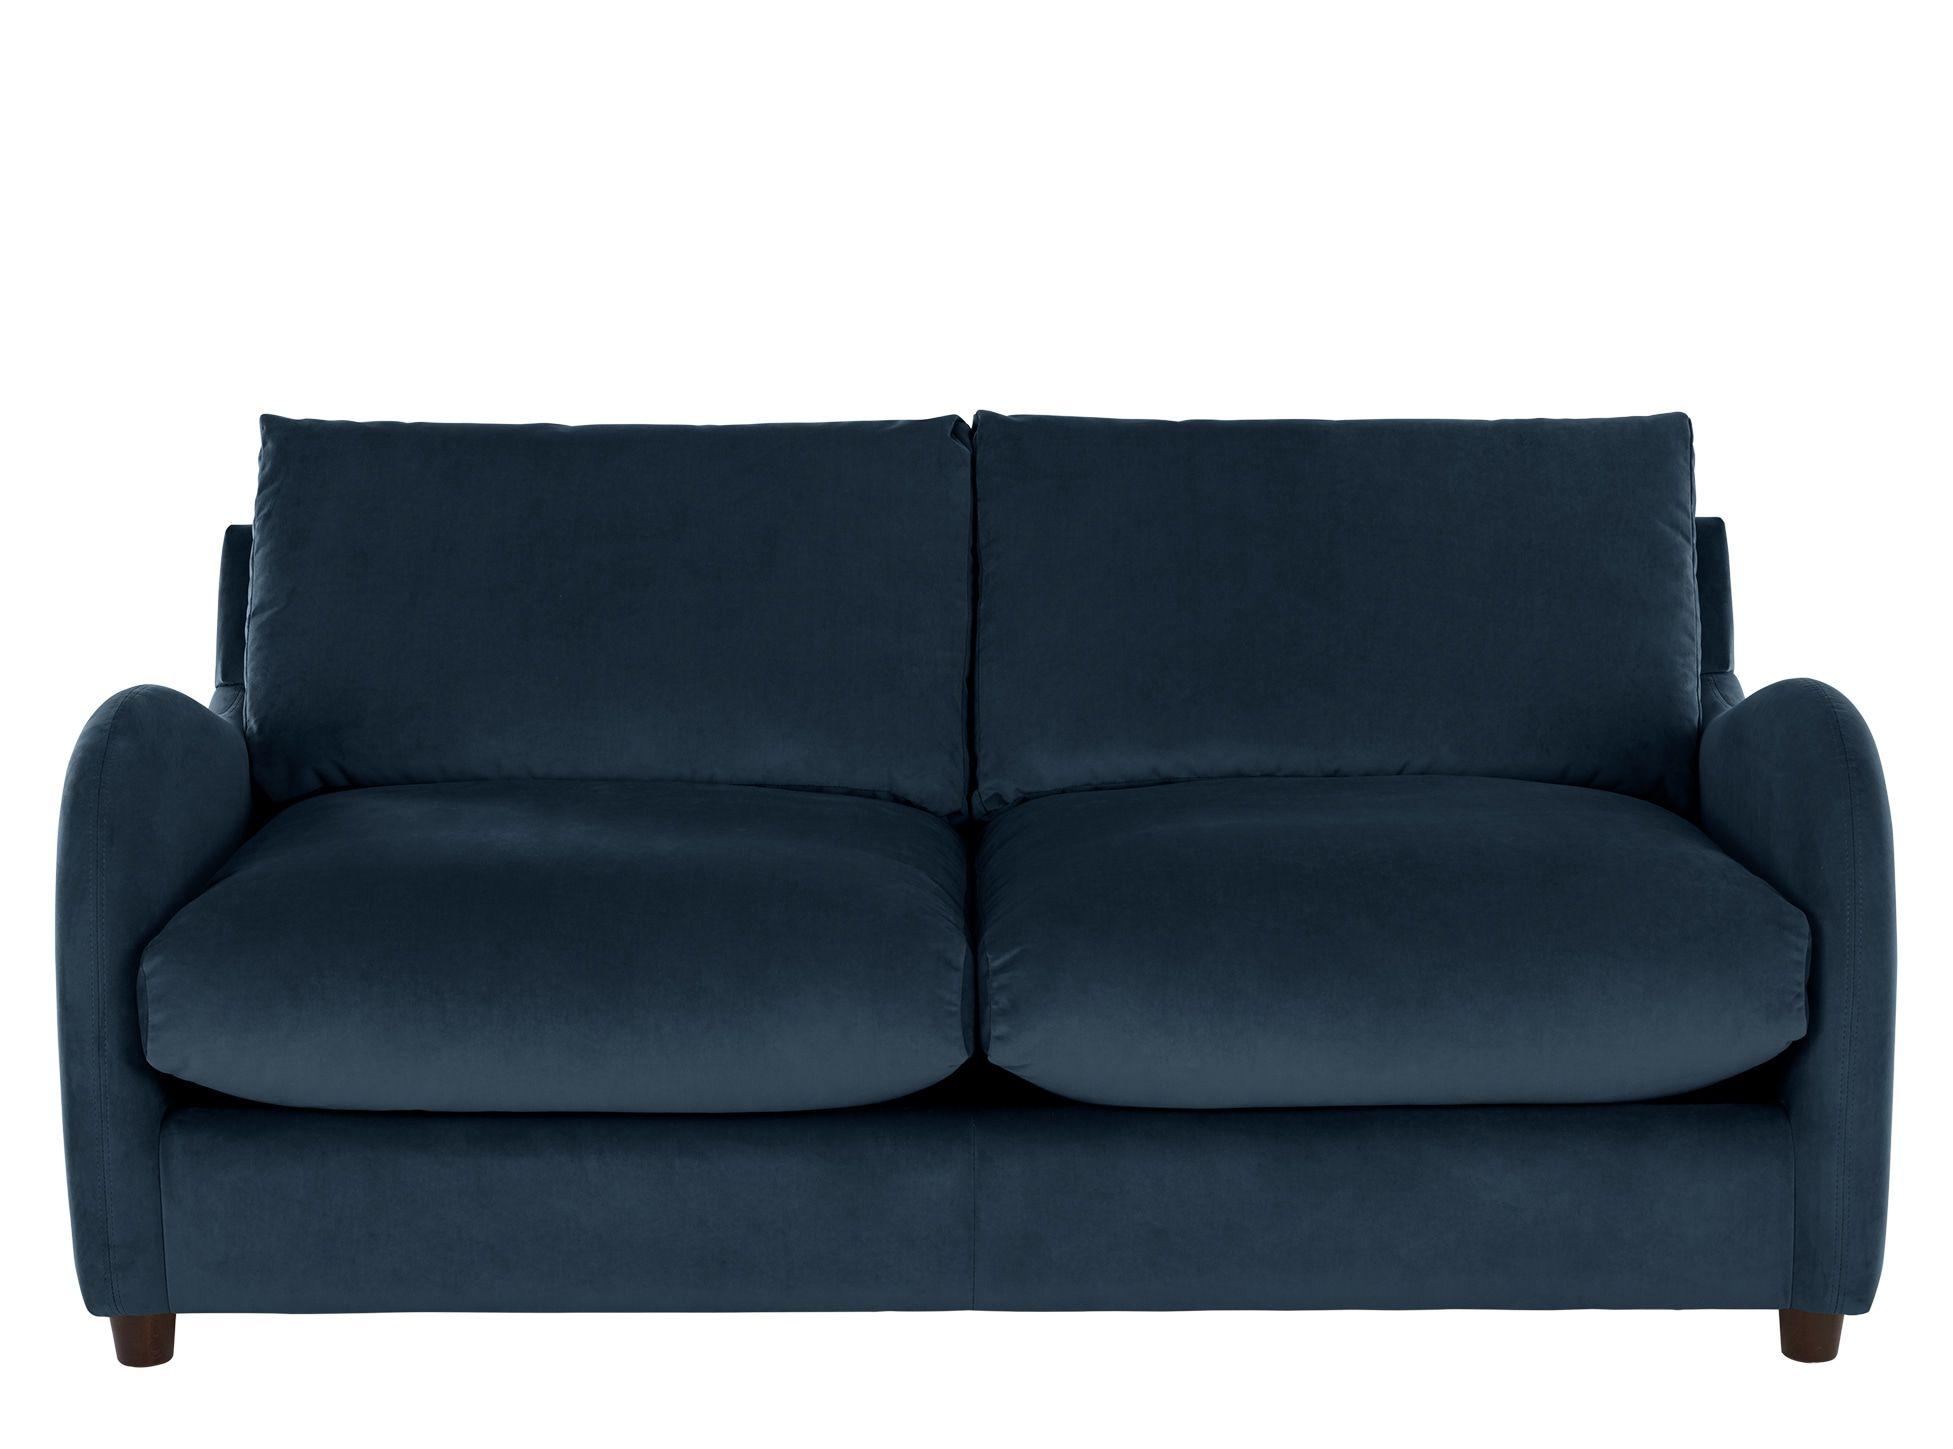 Delife Eu Big Sofa Cabana 304x140 Cm Braun Vintage Look By